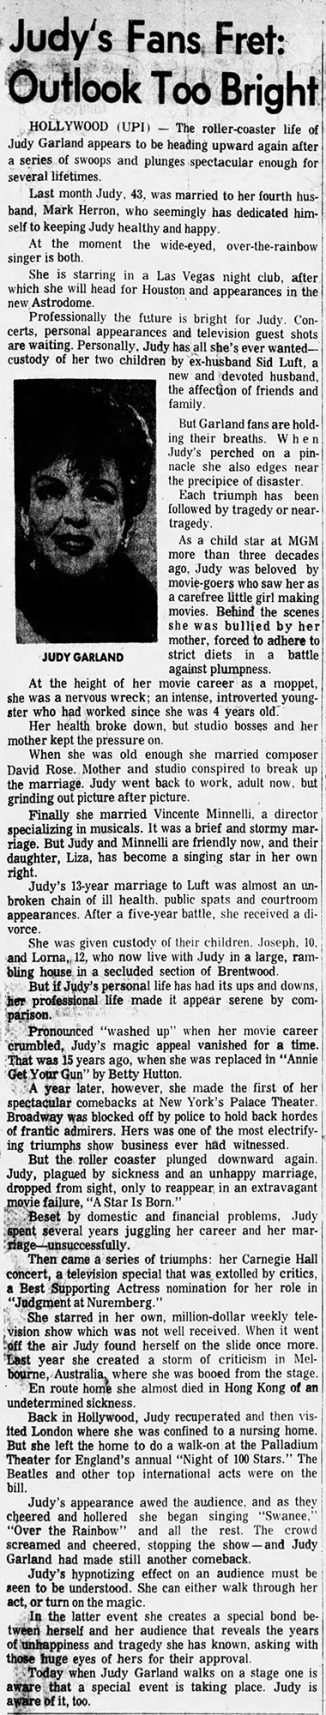 December-11,-1965-JUDY-ON-UPSWING-Oakland_Tribune